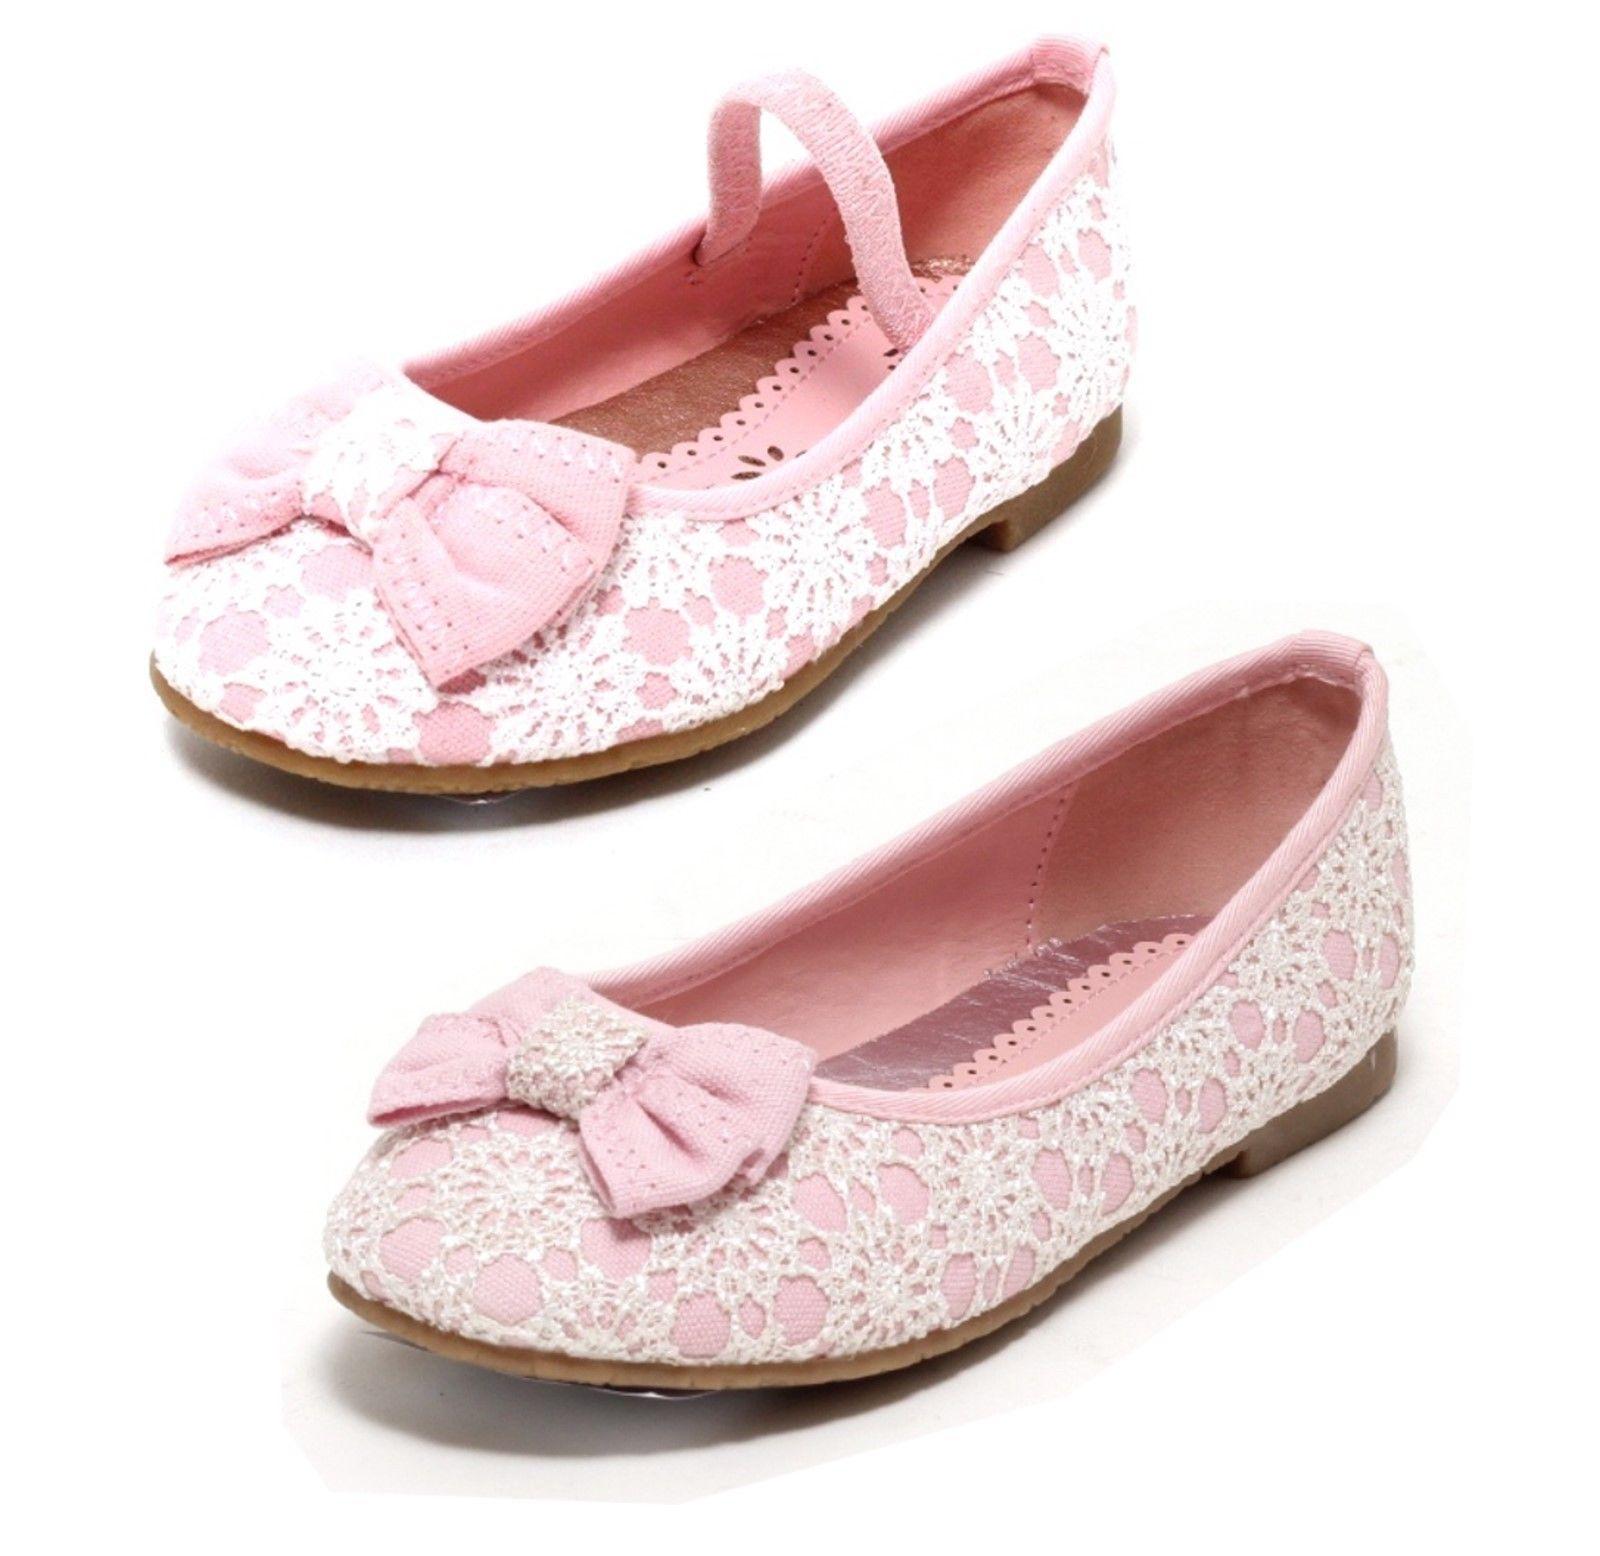 m dchen ballerinas mit spitze sommerschuhe schuhe rosa slipper kinder sandalen kleidung kinderschuhe. Black Bedroom Furniture Sets. Home Design Ideas